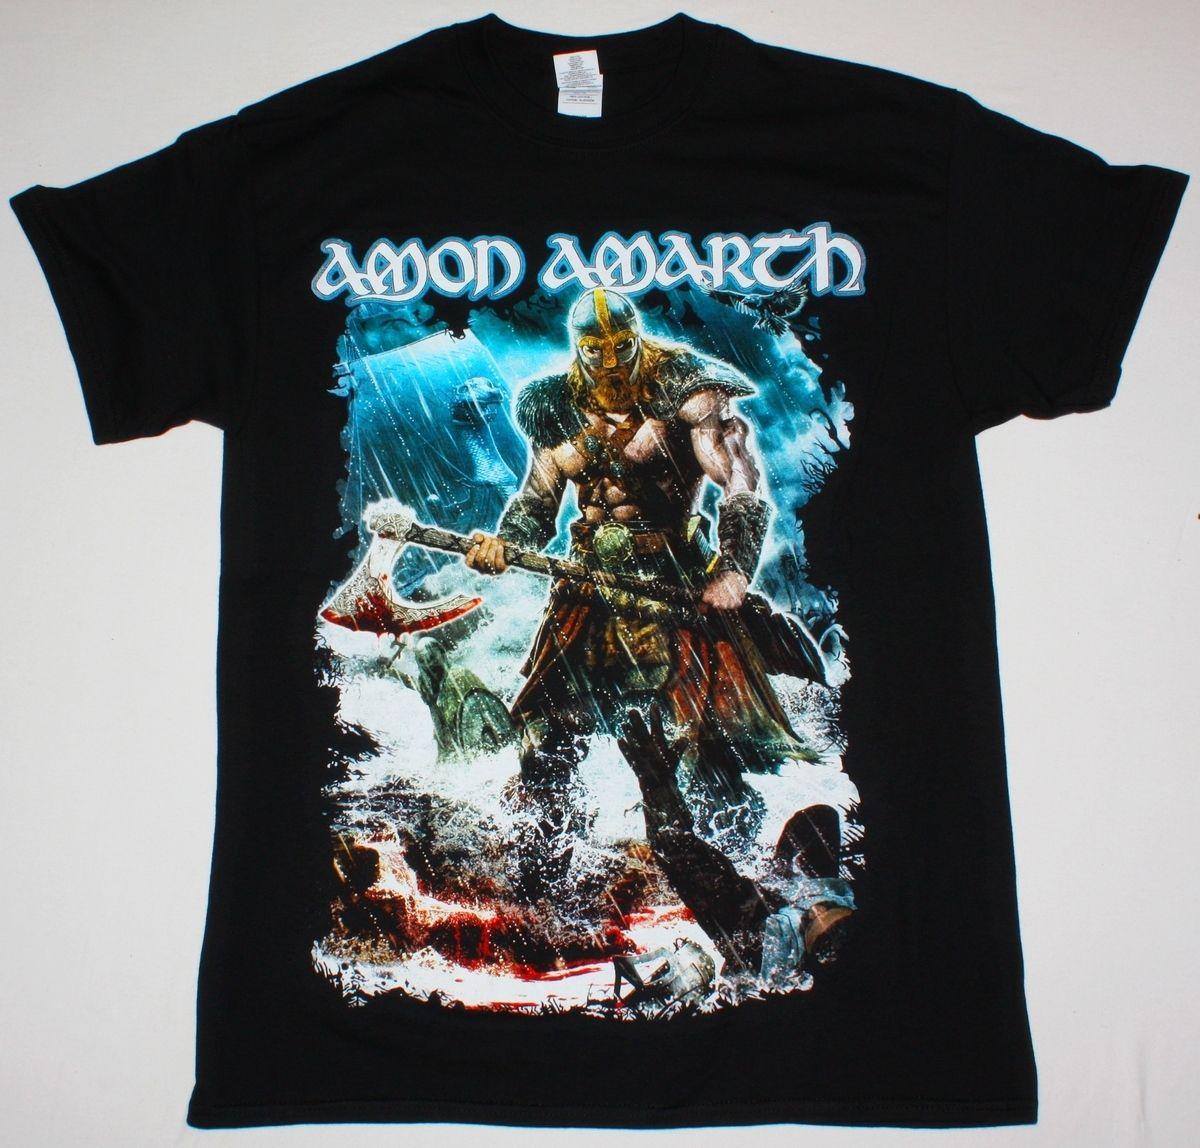 AMON AMARTH JOMSVIKING DEATH METAL CHILDREN OF BODOM AMORPHIS NEW BLACK T-SHIRT Summer Man T Shirt Tops Tees New